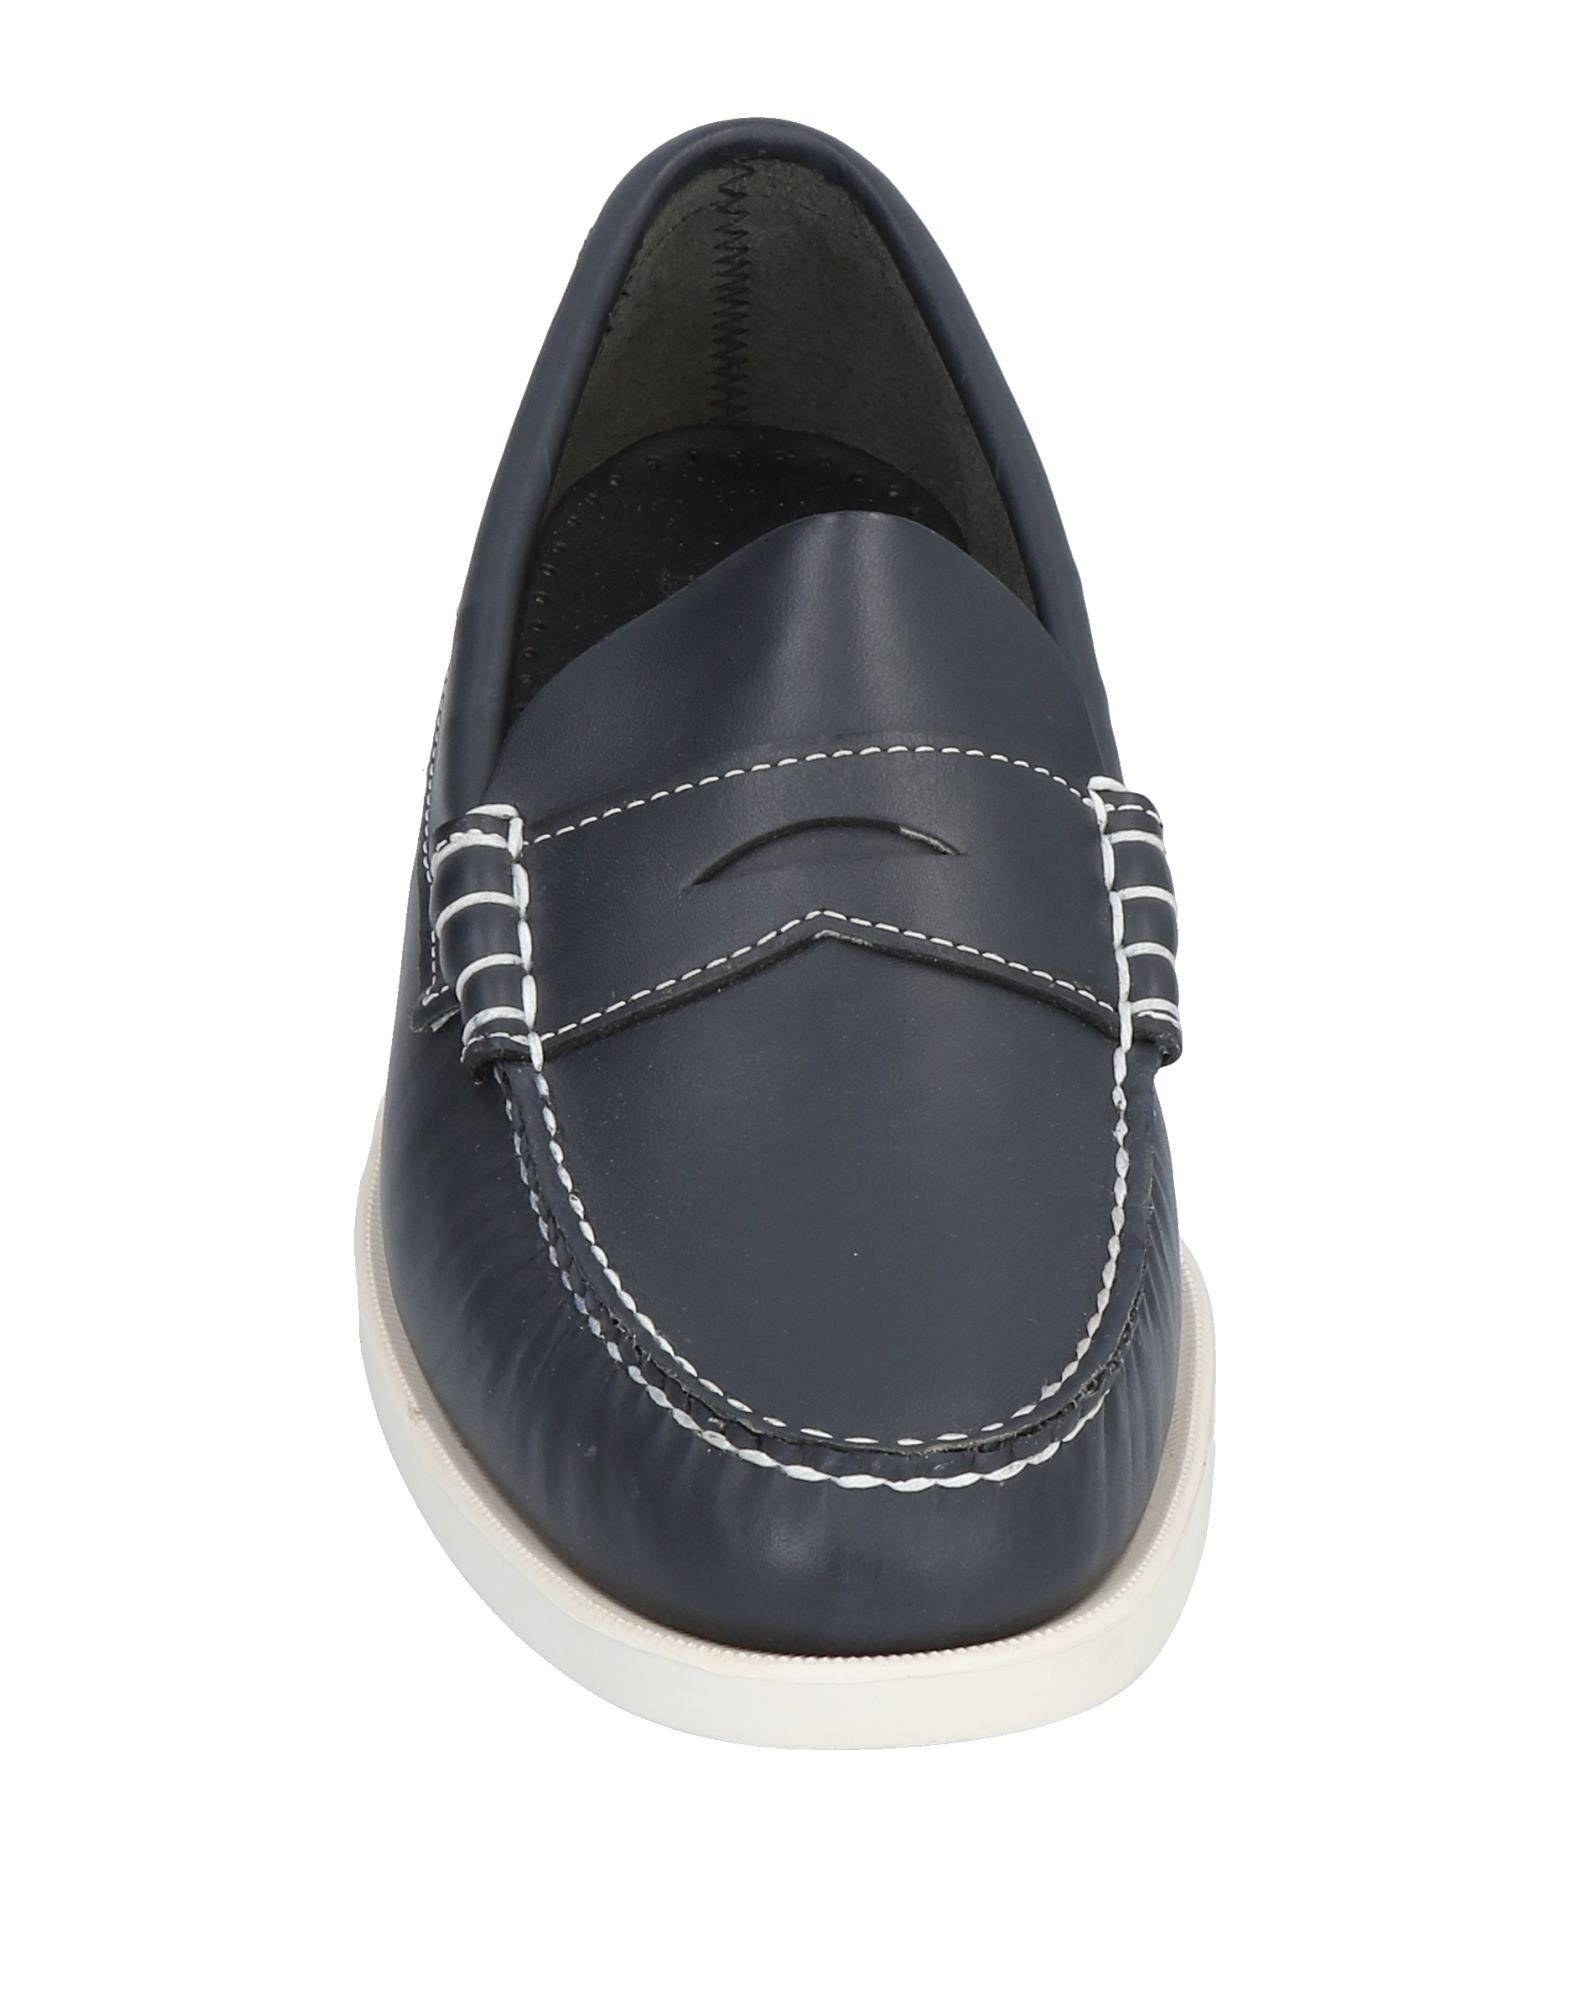 Sebago Docksides Mokassins Herren  Schuhe 11472358DO Gute Qualität beliebte Schuhe  c85f04